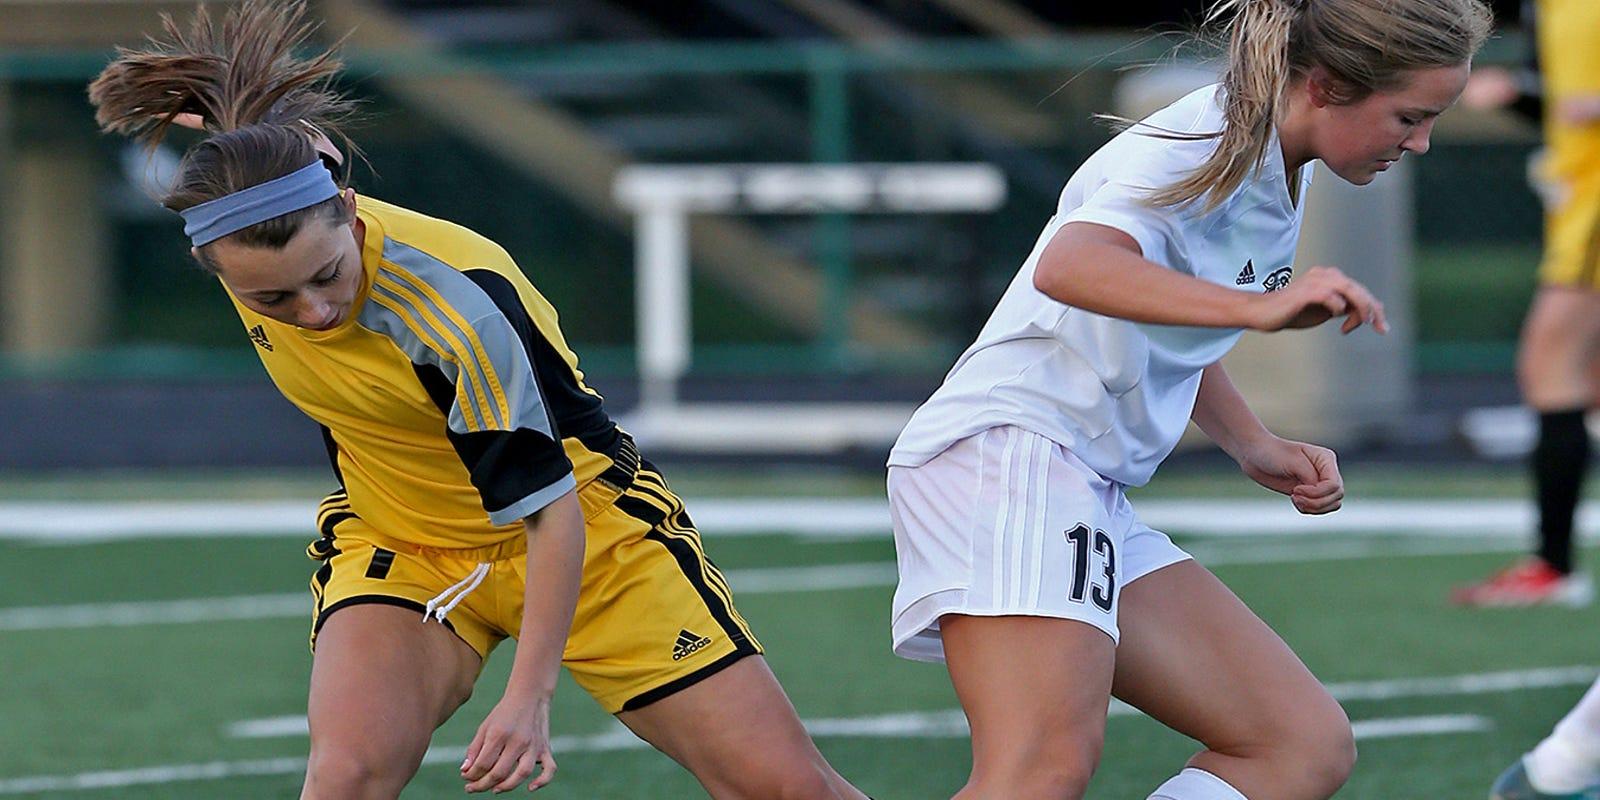 Alli Grimes friday's high school roundup: soccer, golf, tennis, track